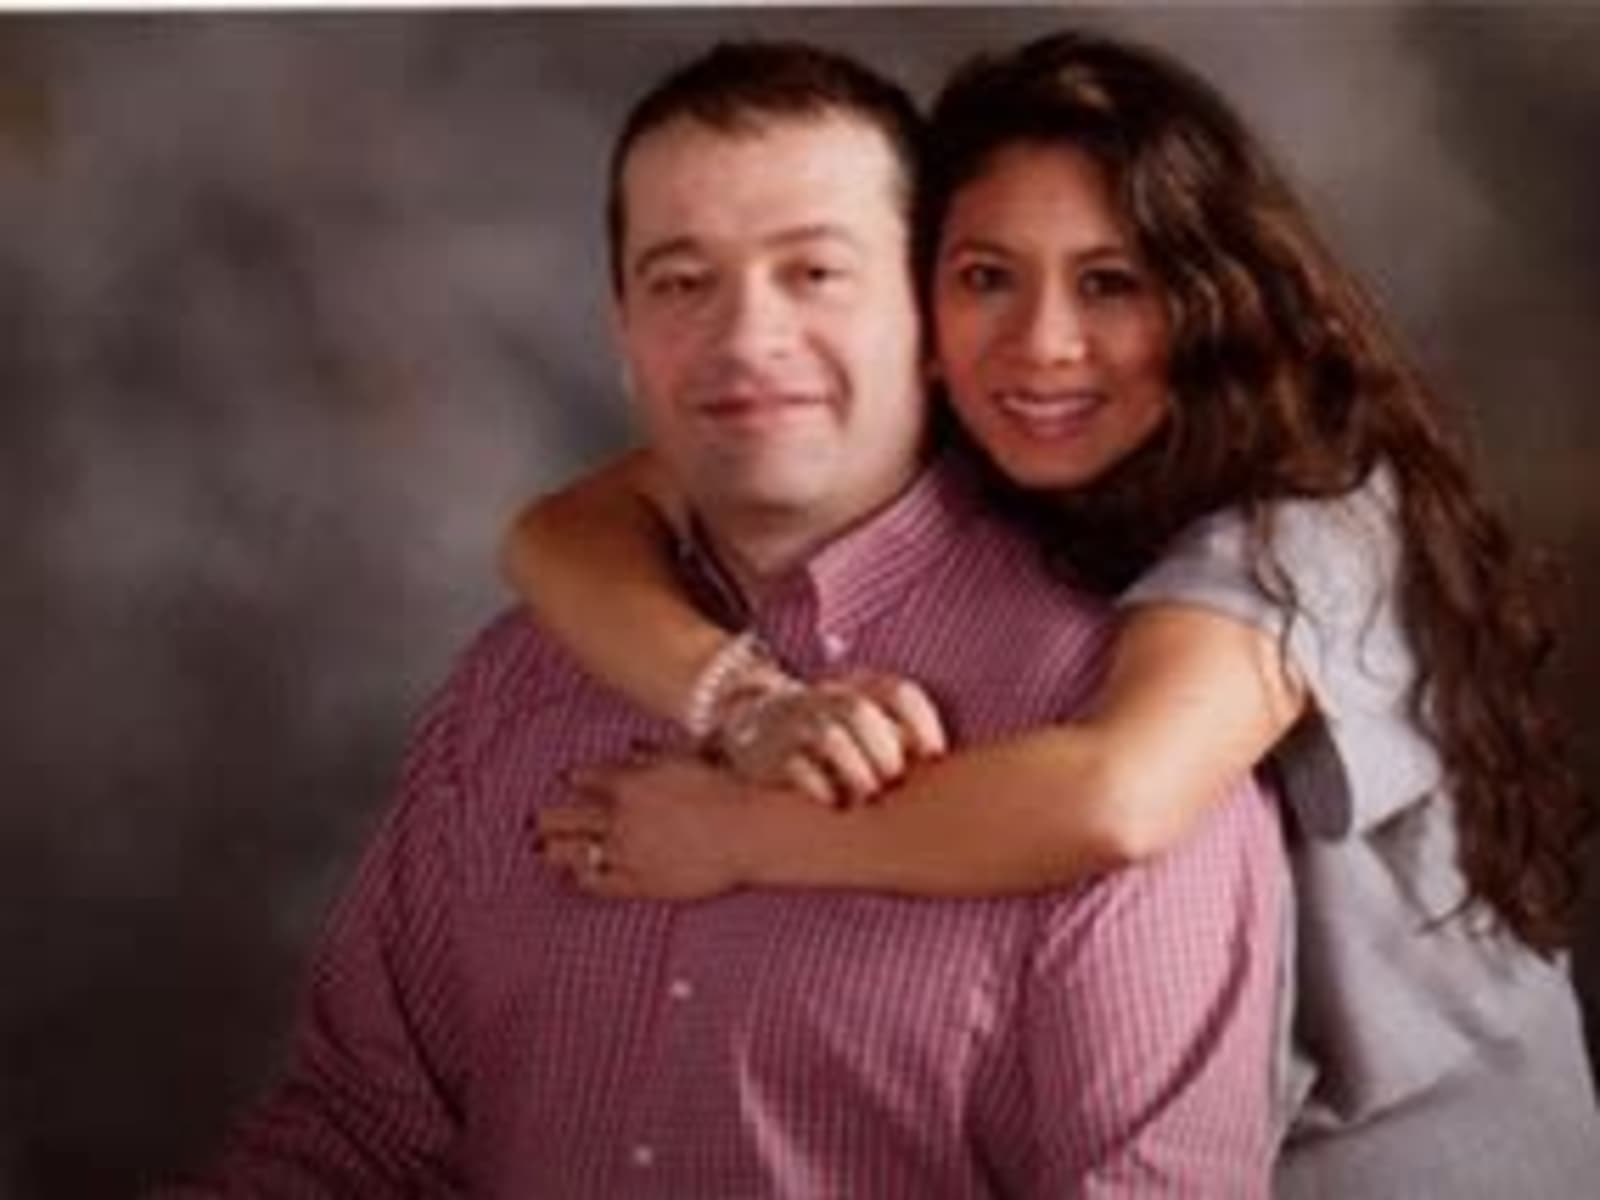 Teresa & John from Port Angeles, Washington, United States